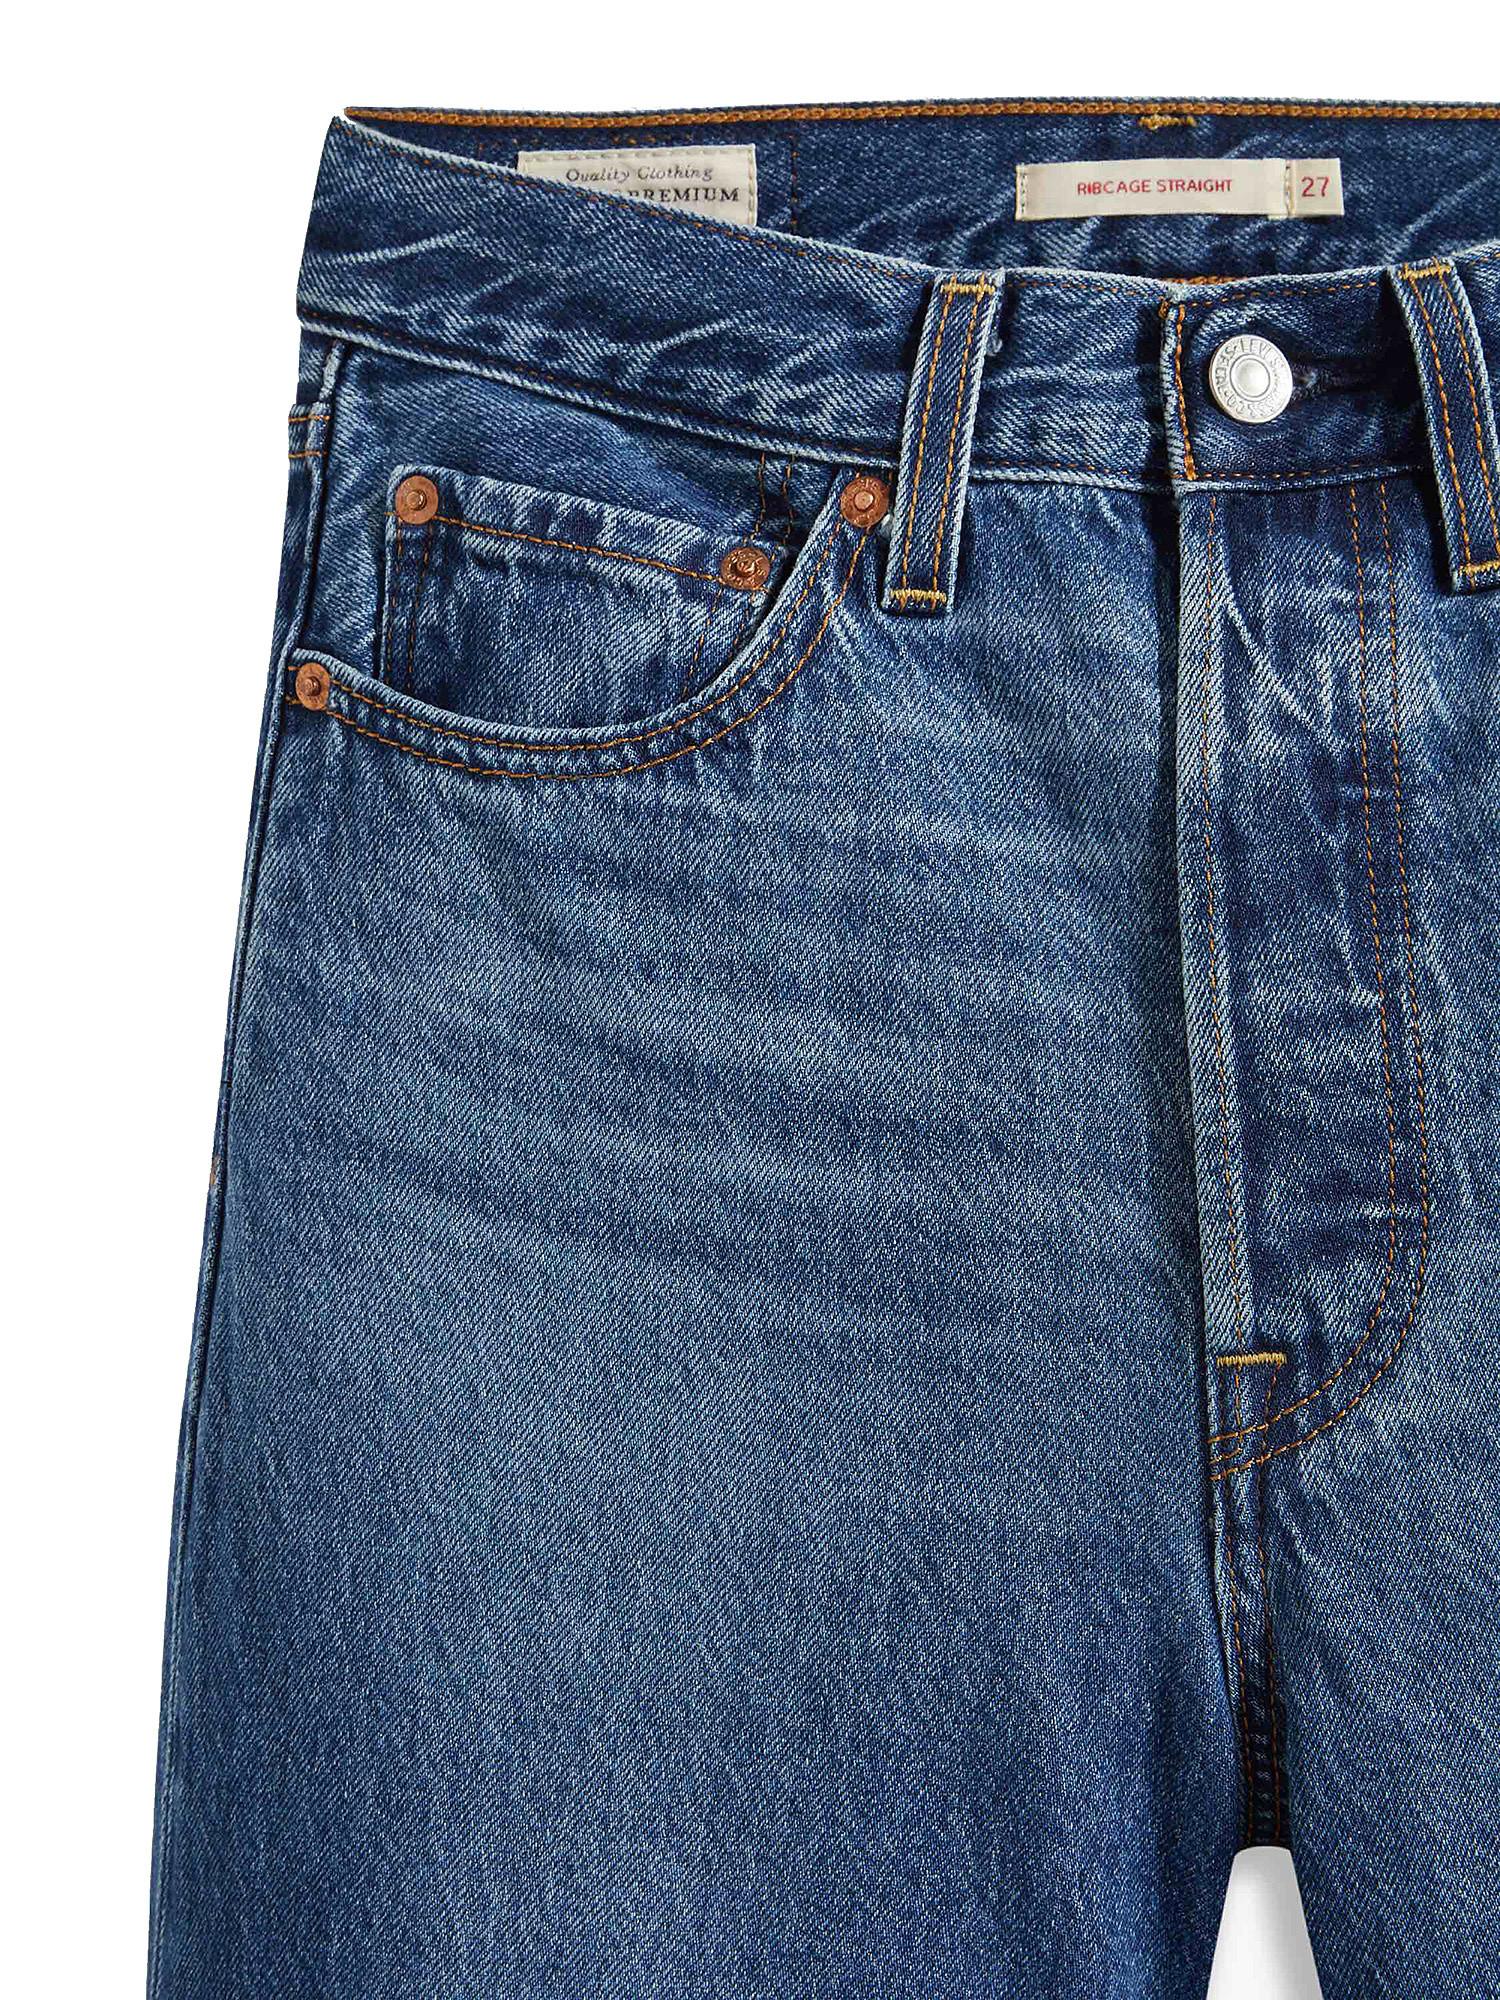 Jeans donna ribcage straight ankle, Denim, large image number 4